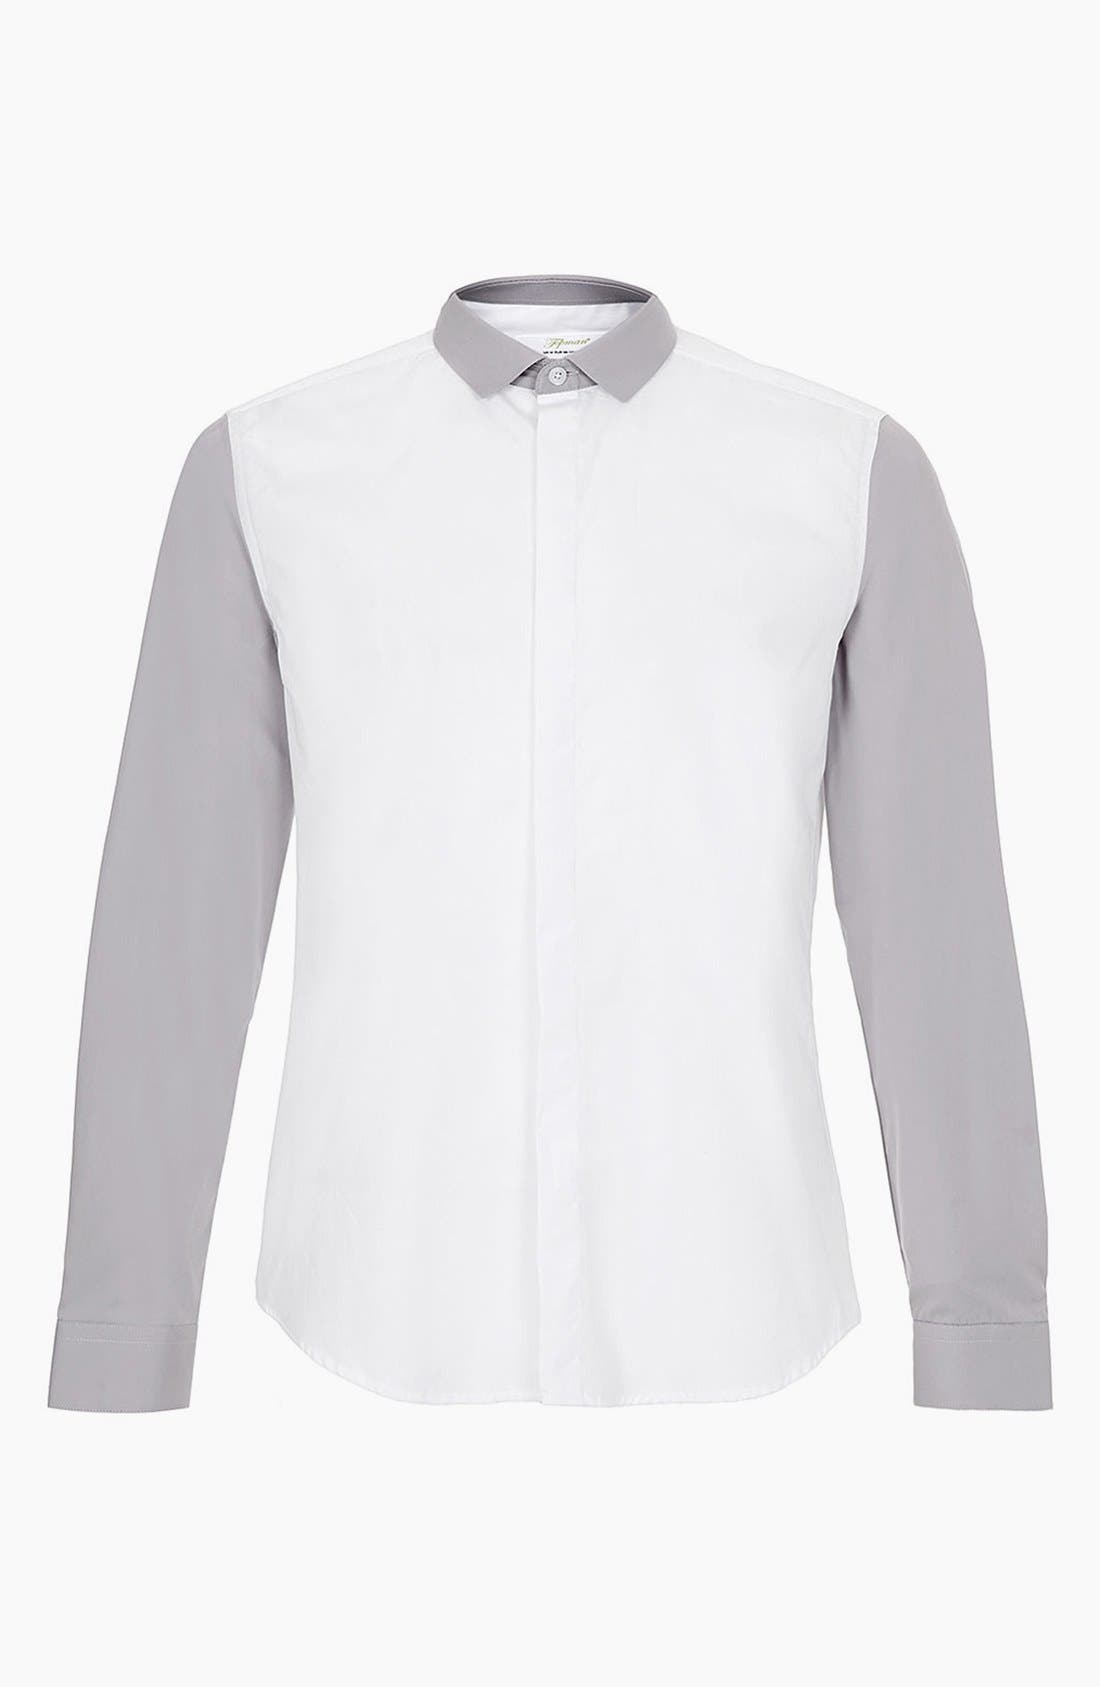 Topman 'Smart' Extra Trim Contrast Dress Shirt, Main, color, 100